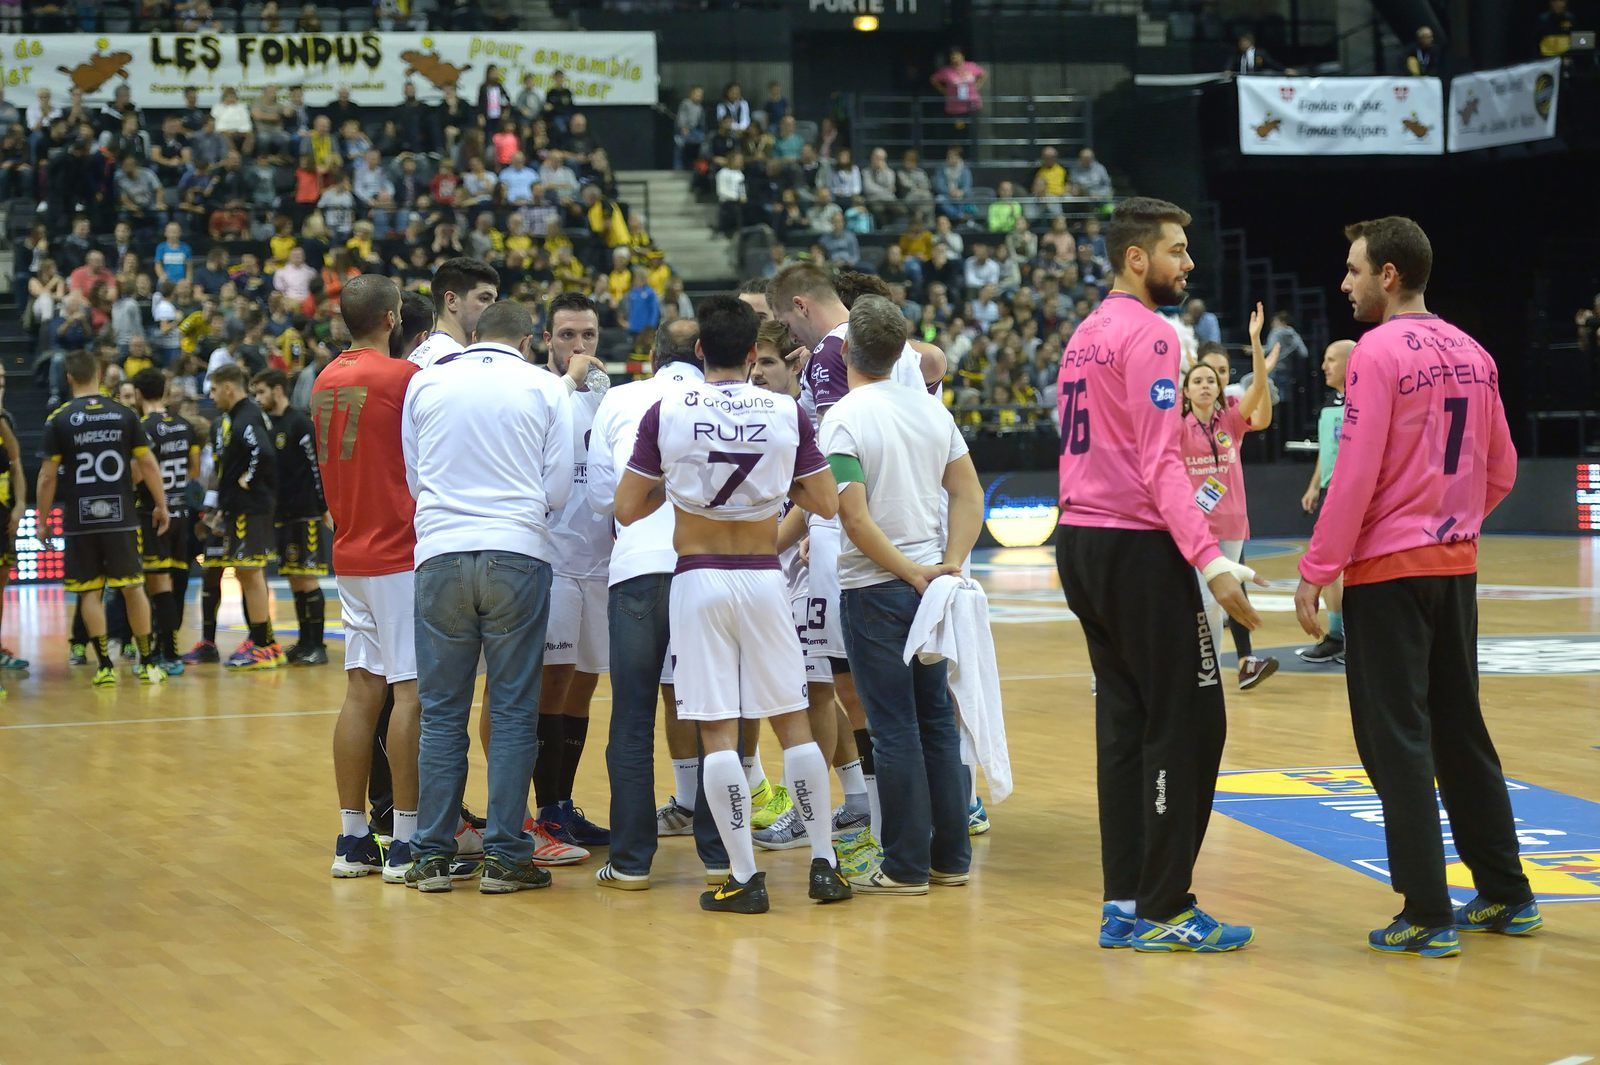 CHAMBERY / ISTRES FIN DE PARCOURS photos du match 22102017